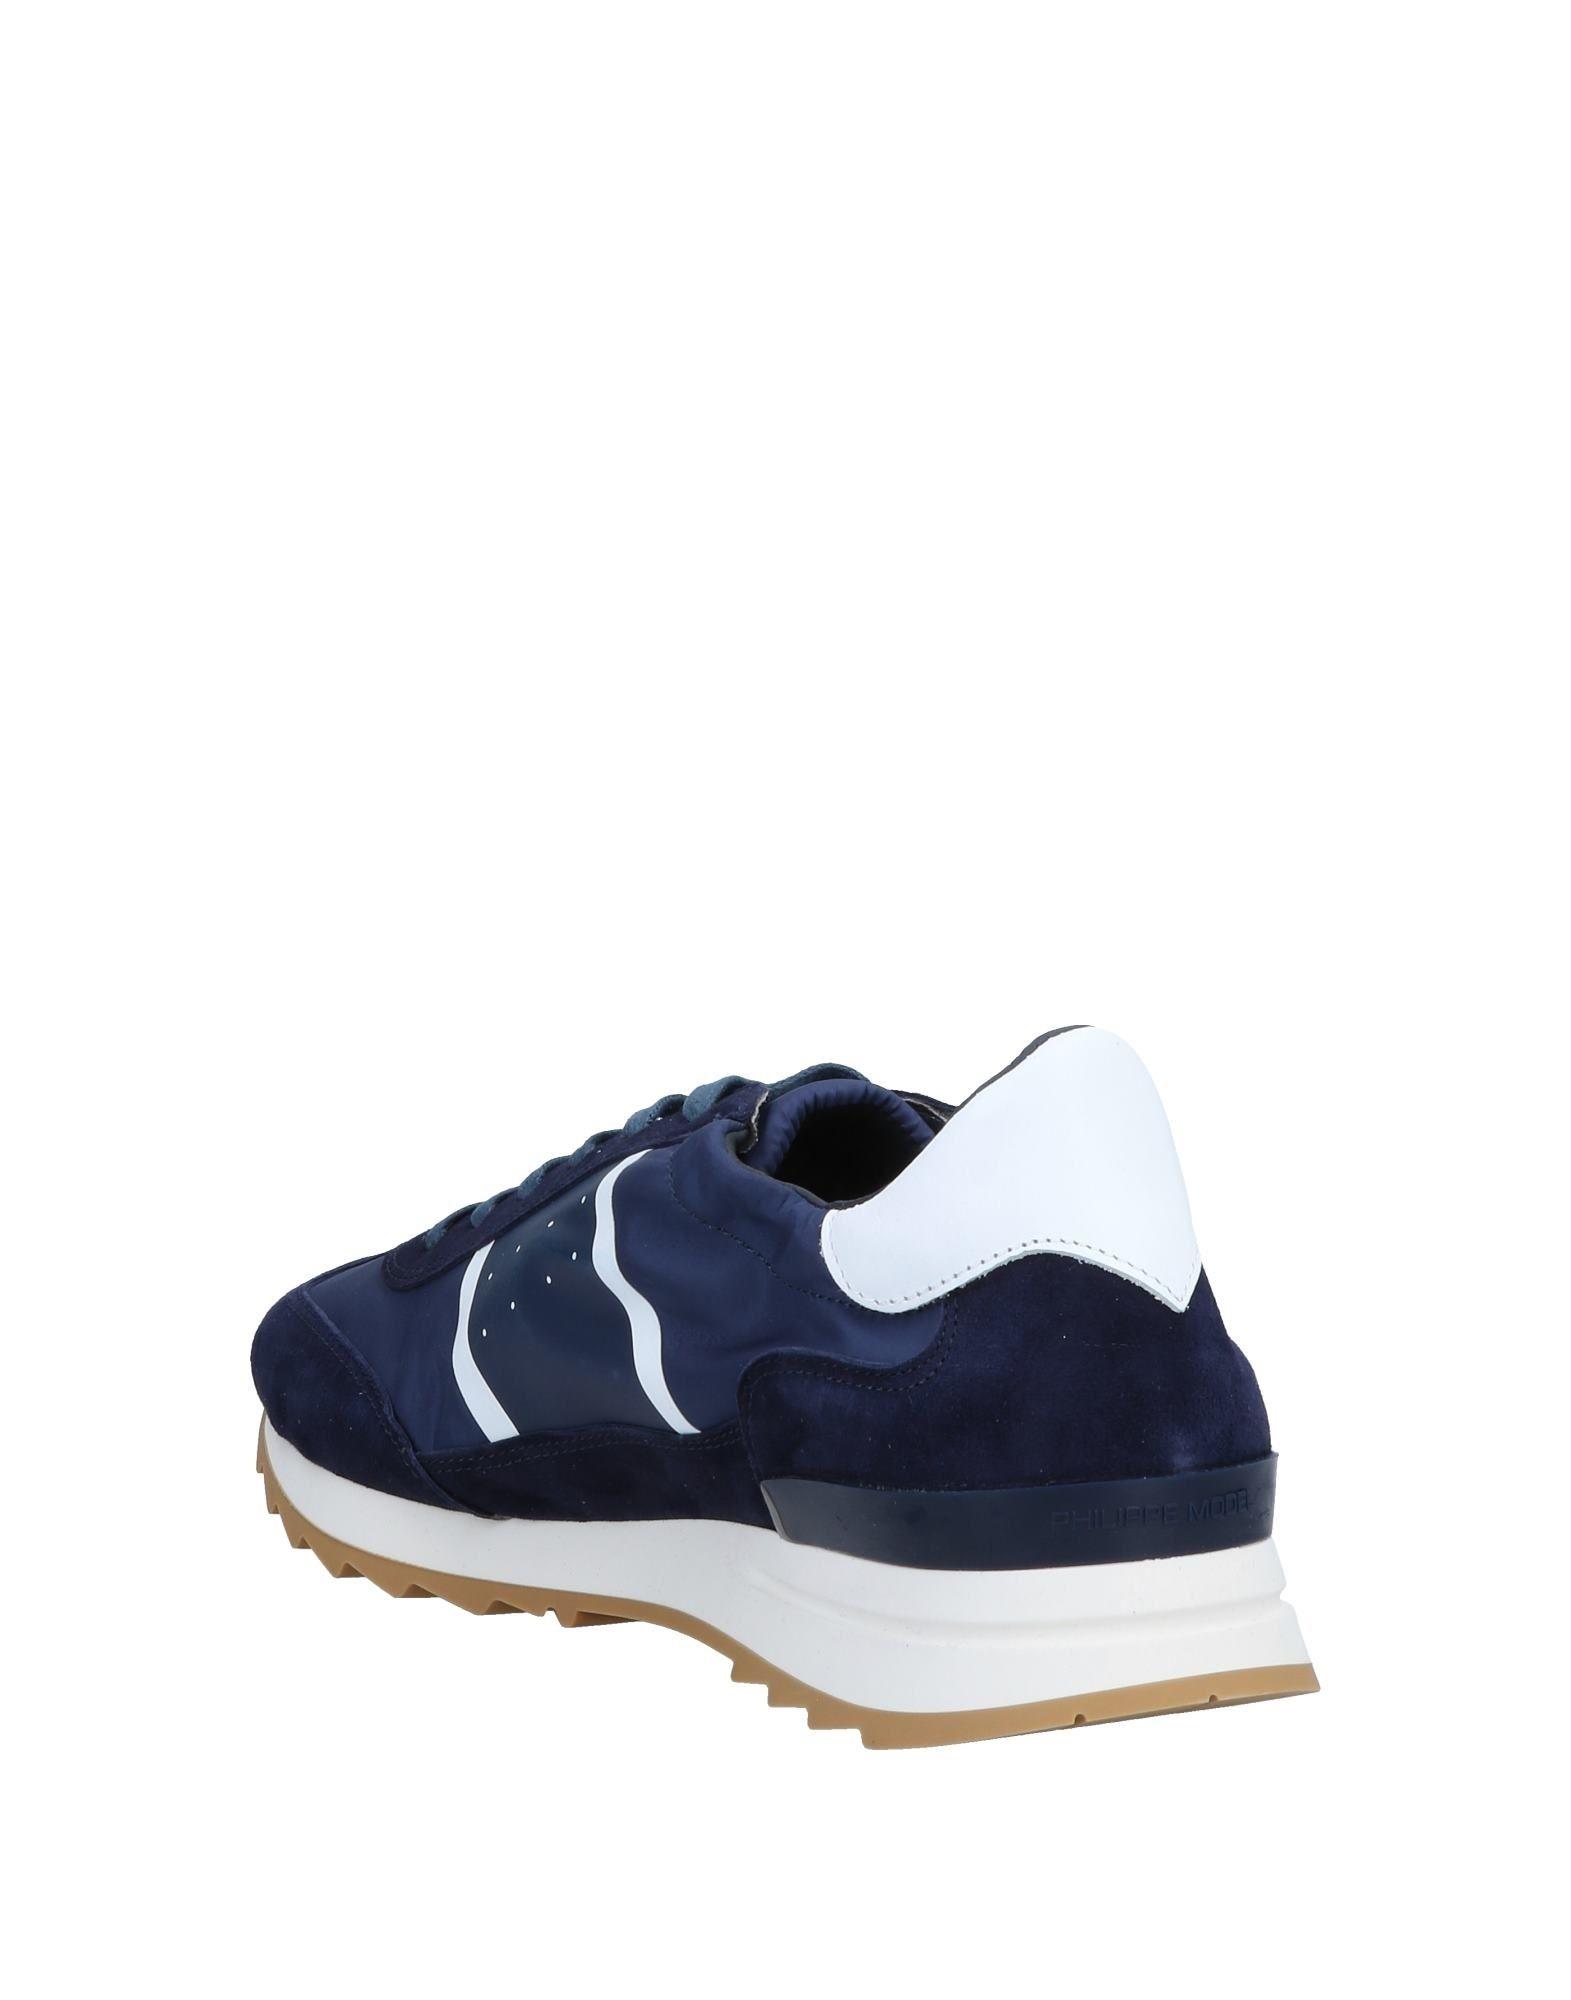 Philippe Model Sneakers Herren es Gutes Preis-Leistungs-Verhältnis, es Herren lohnt sich 27ee0f